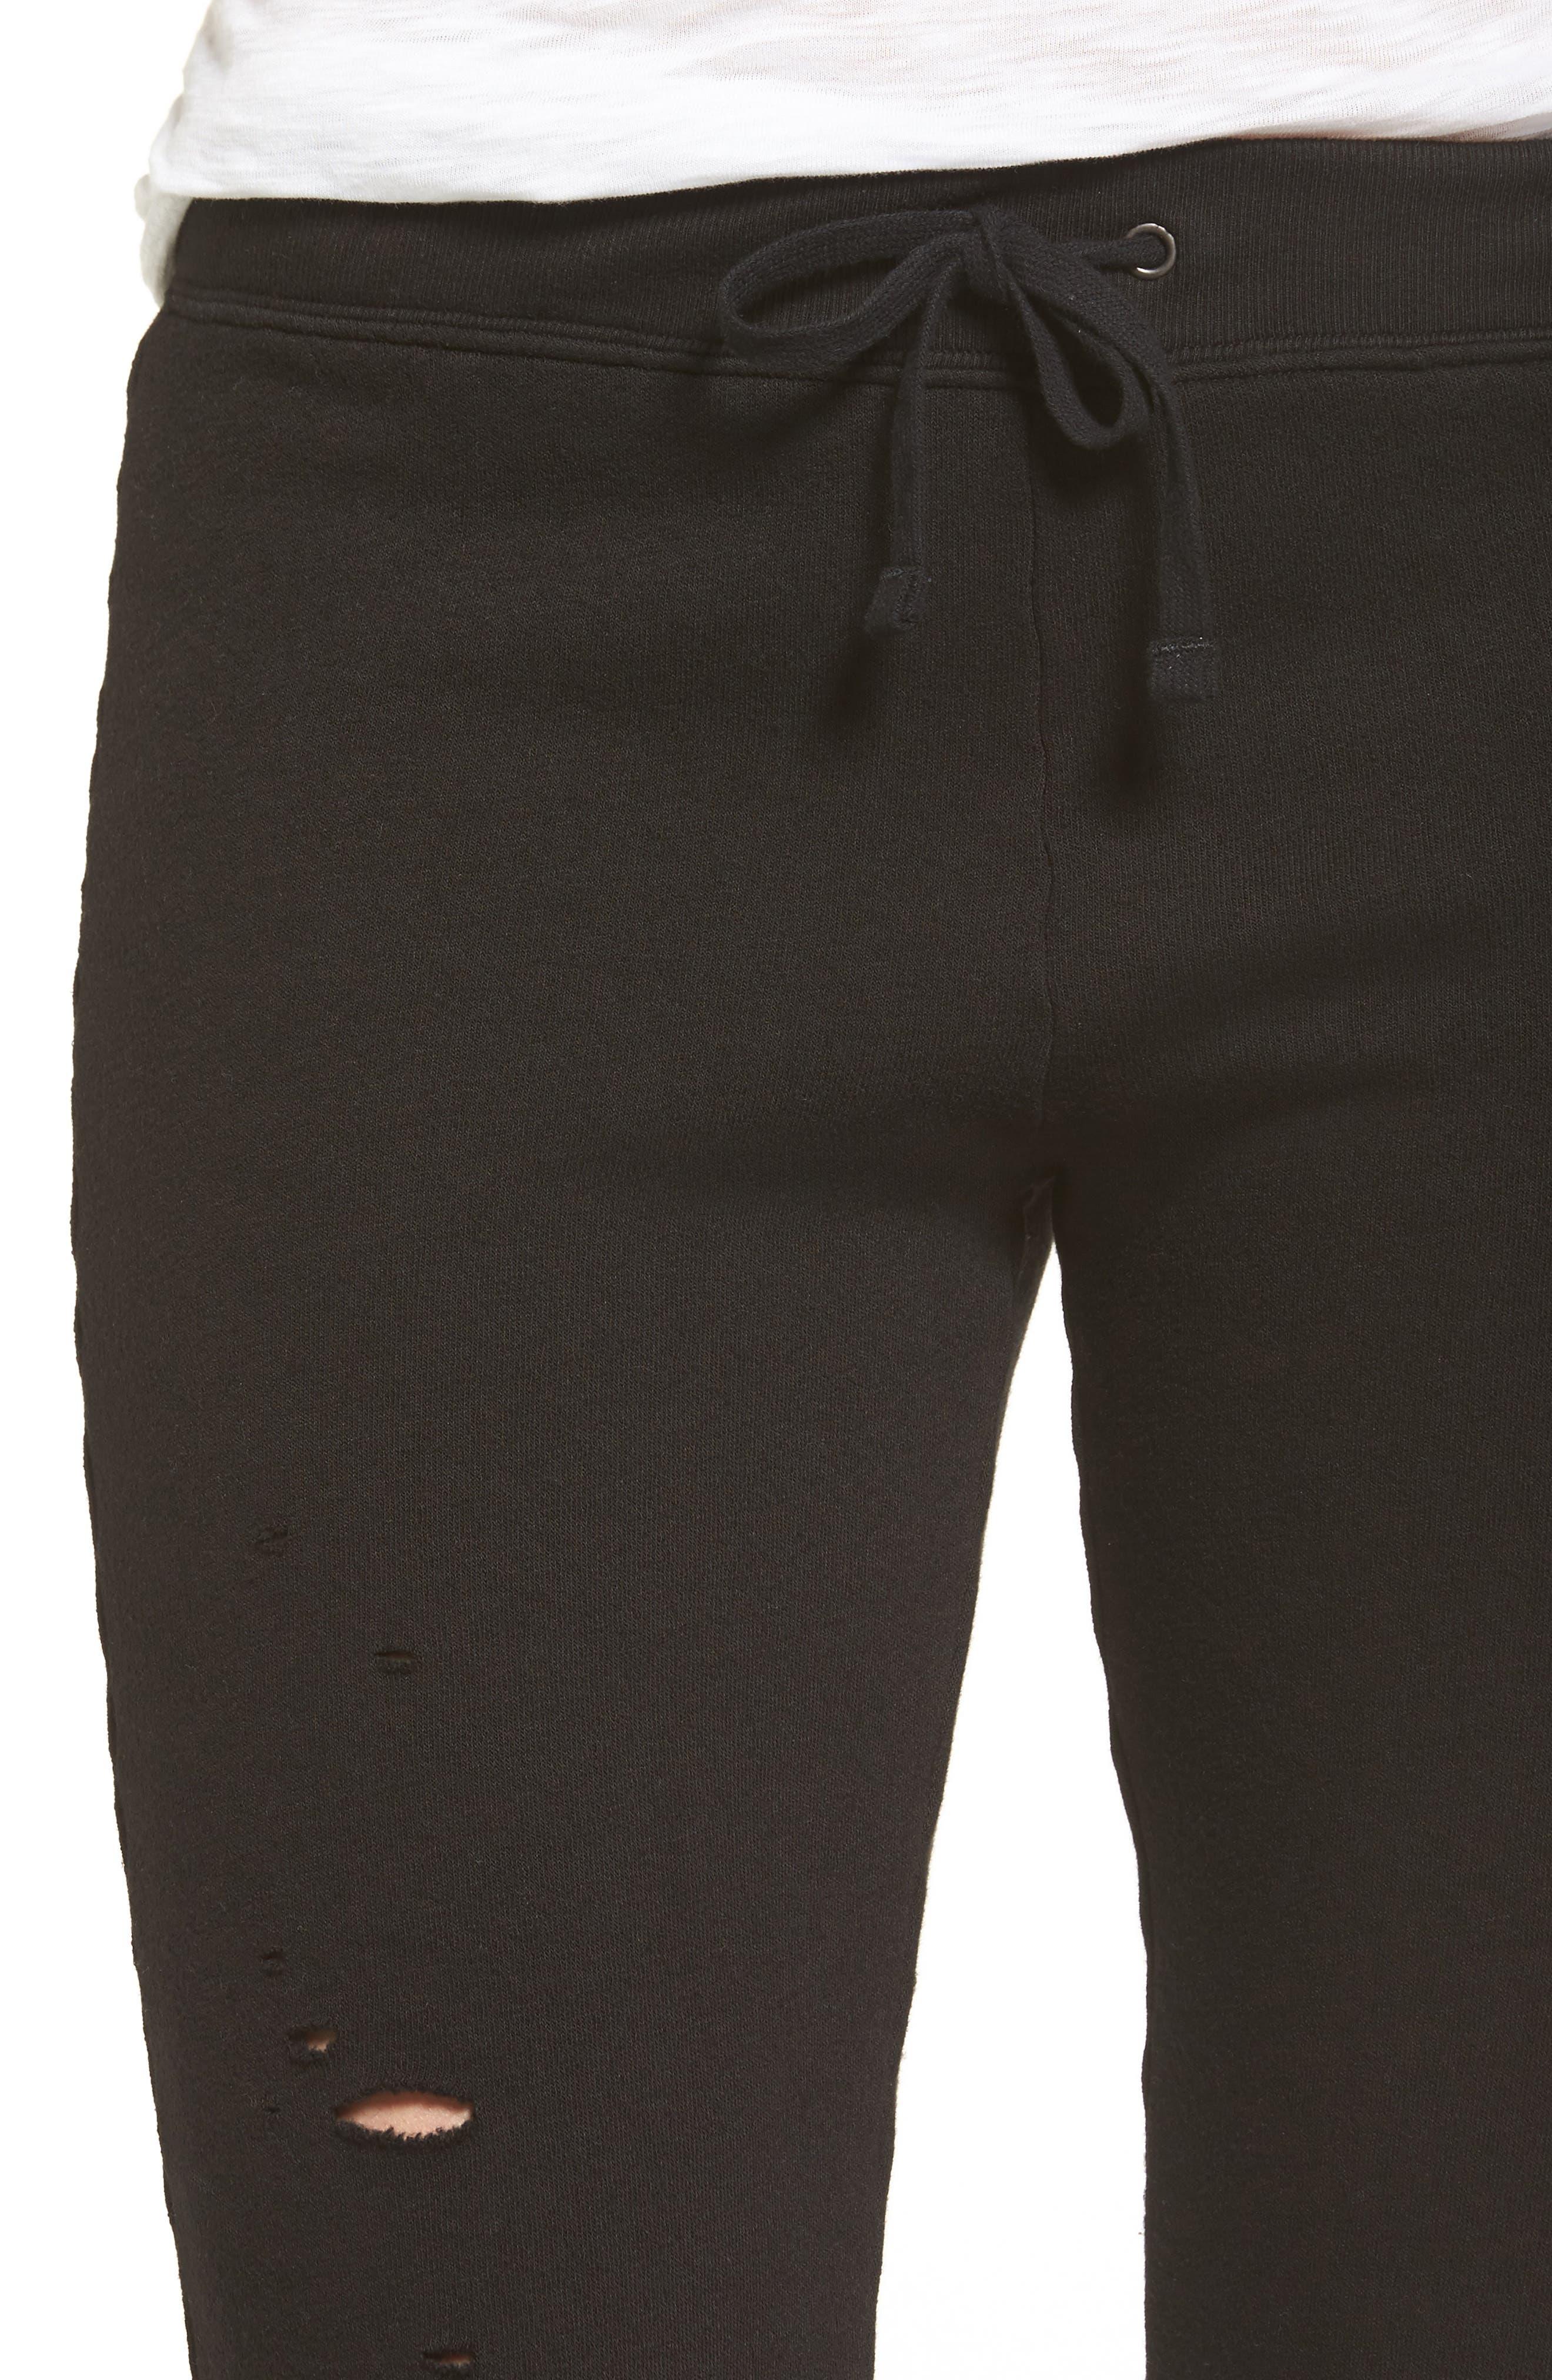 Betsee Distressed Jogger Pants,                             Alternate thumbnail 4, color,                             Black